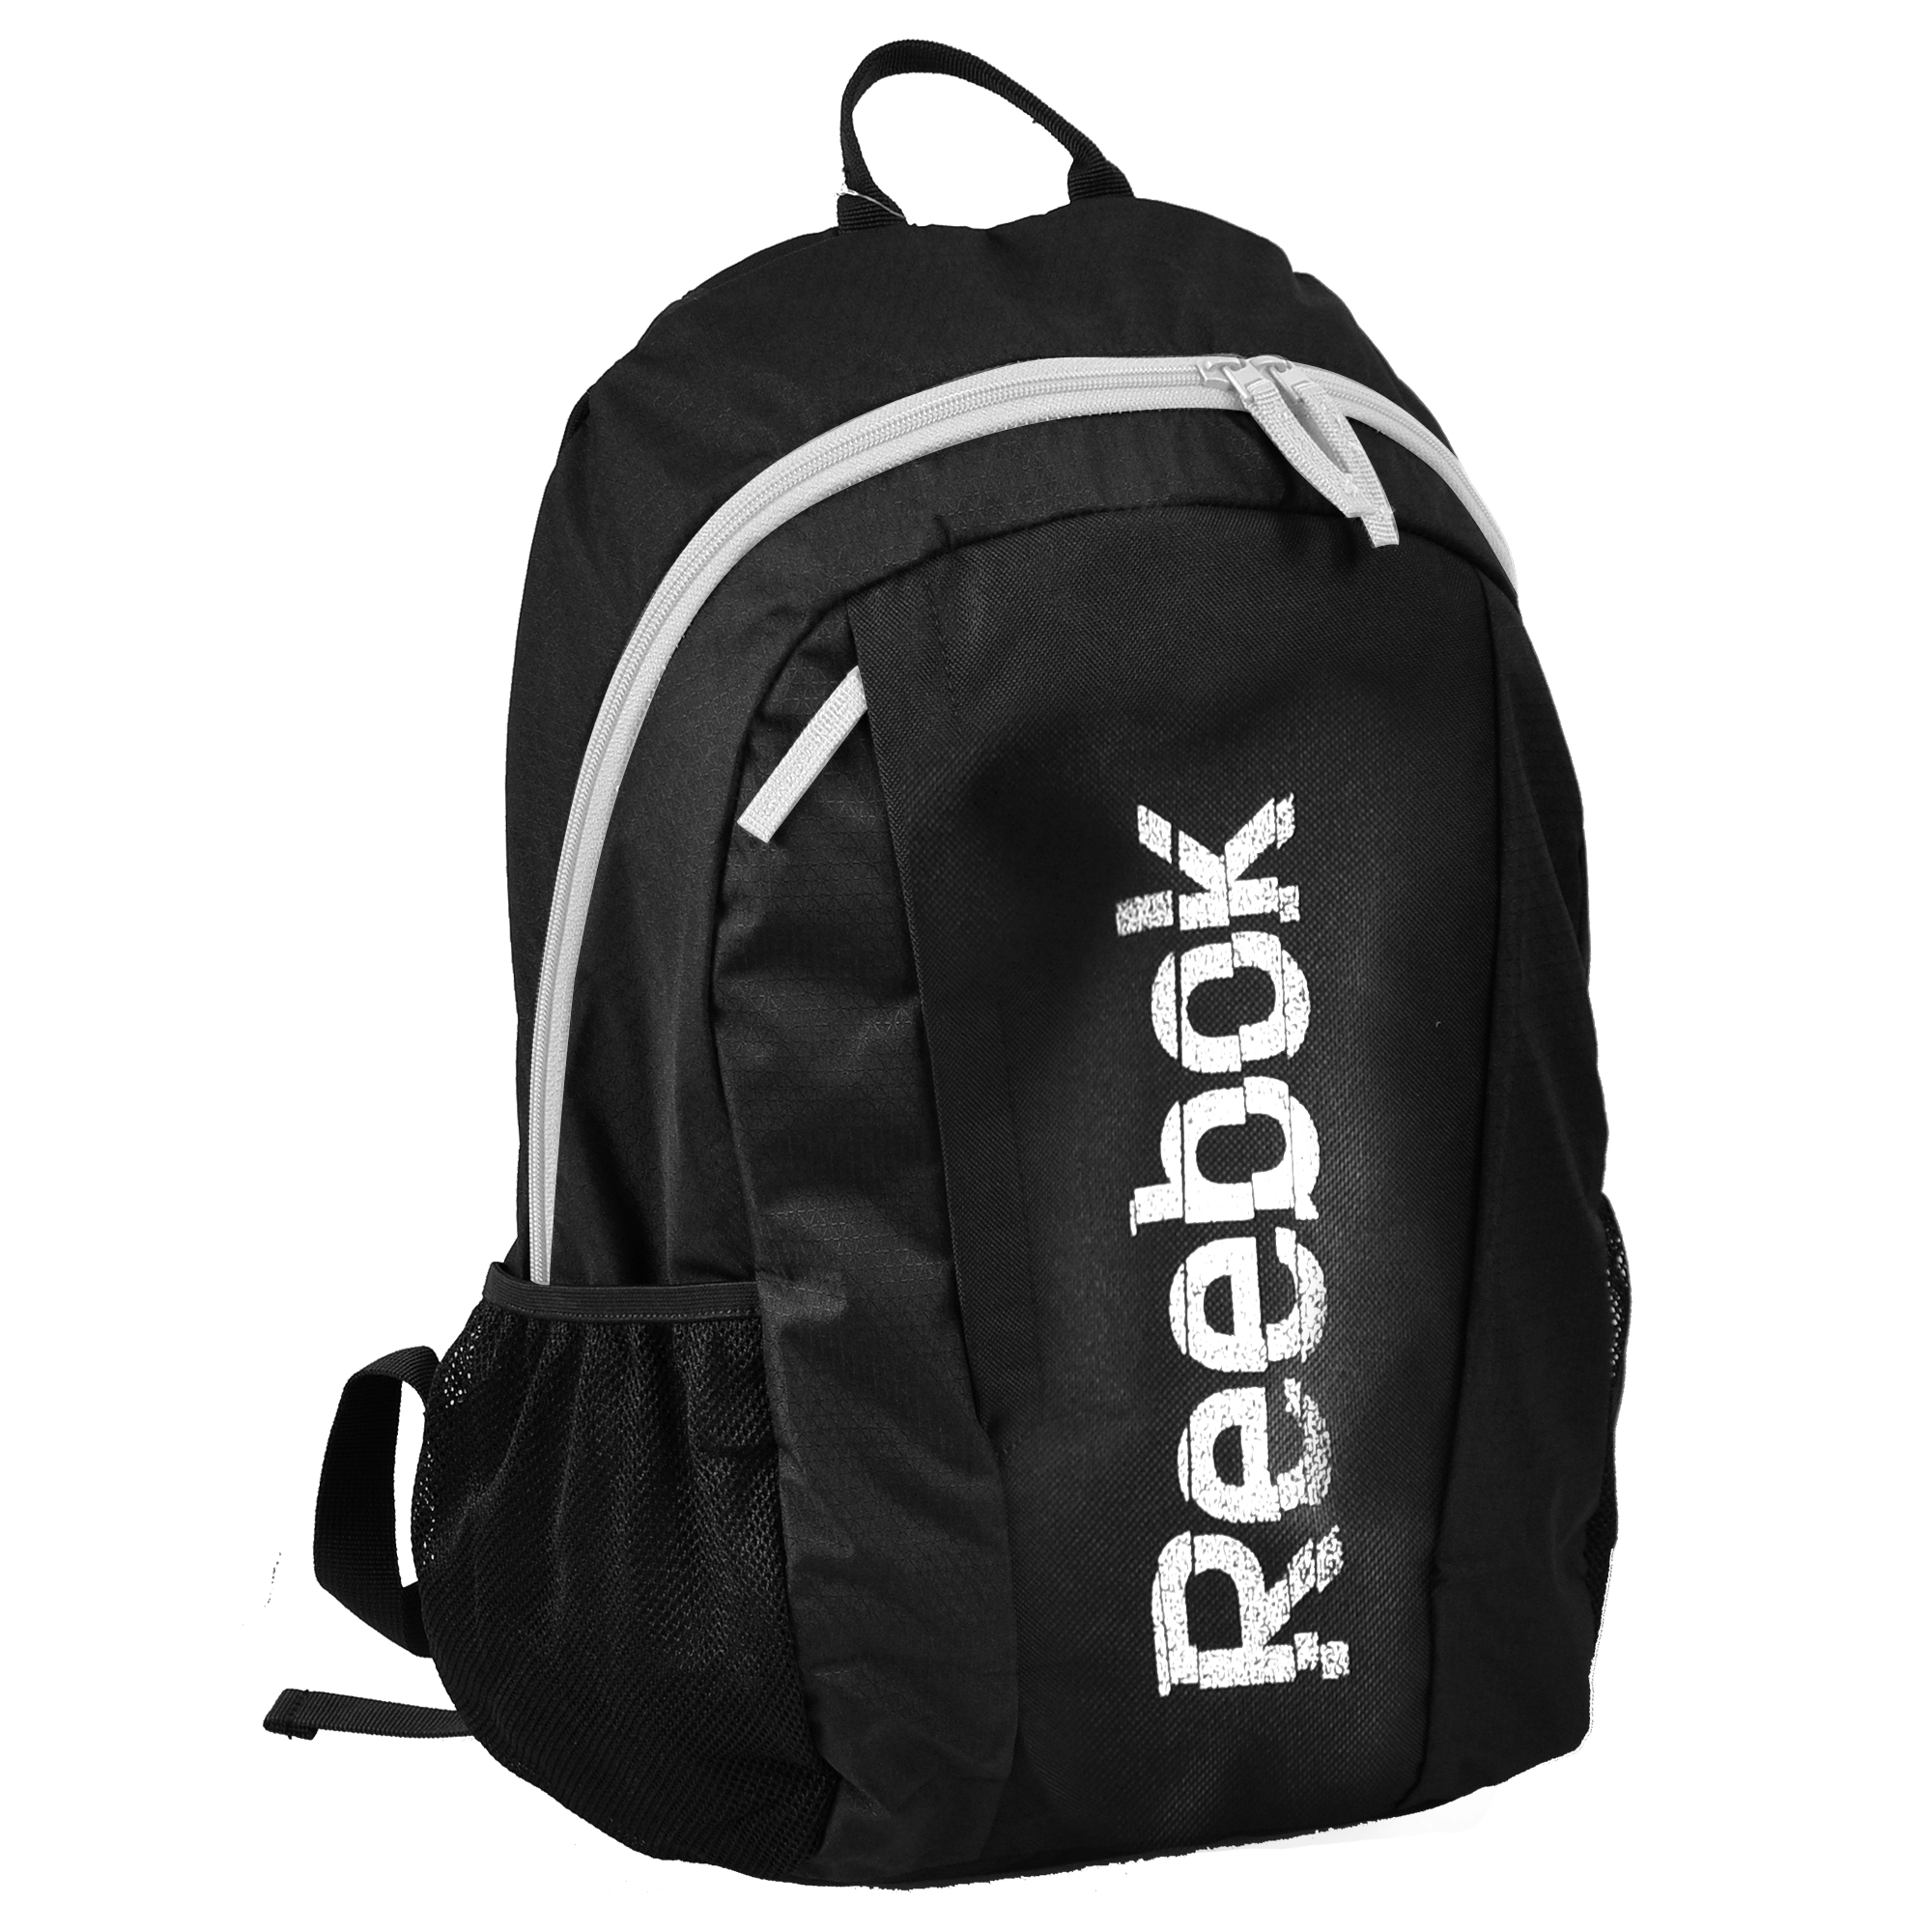 9a60a6831efea Reebok Se Large Backpack Sırt Çantası #AB1124 - Barcin.com